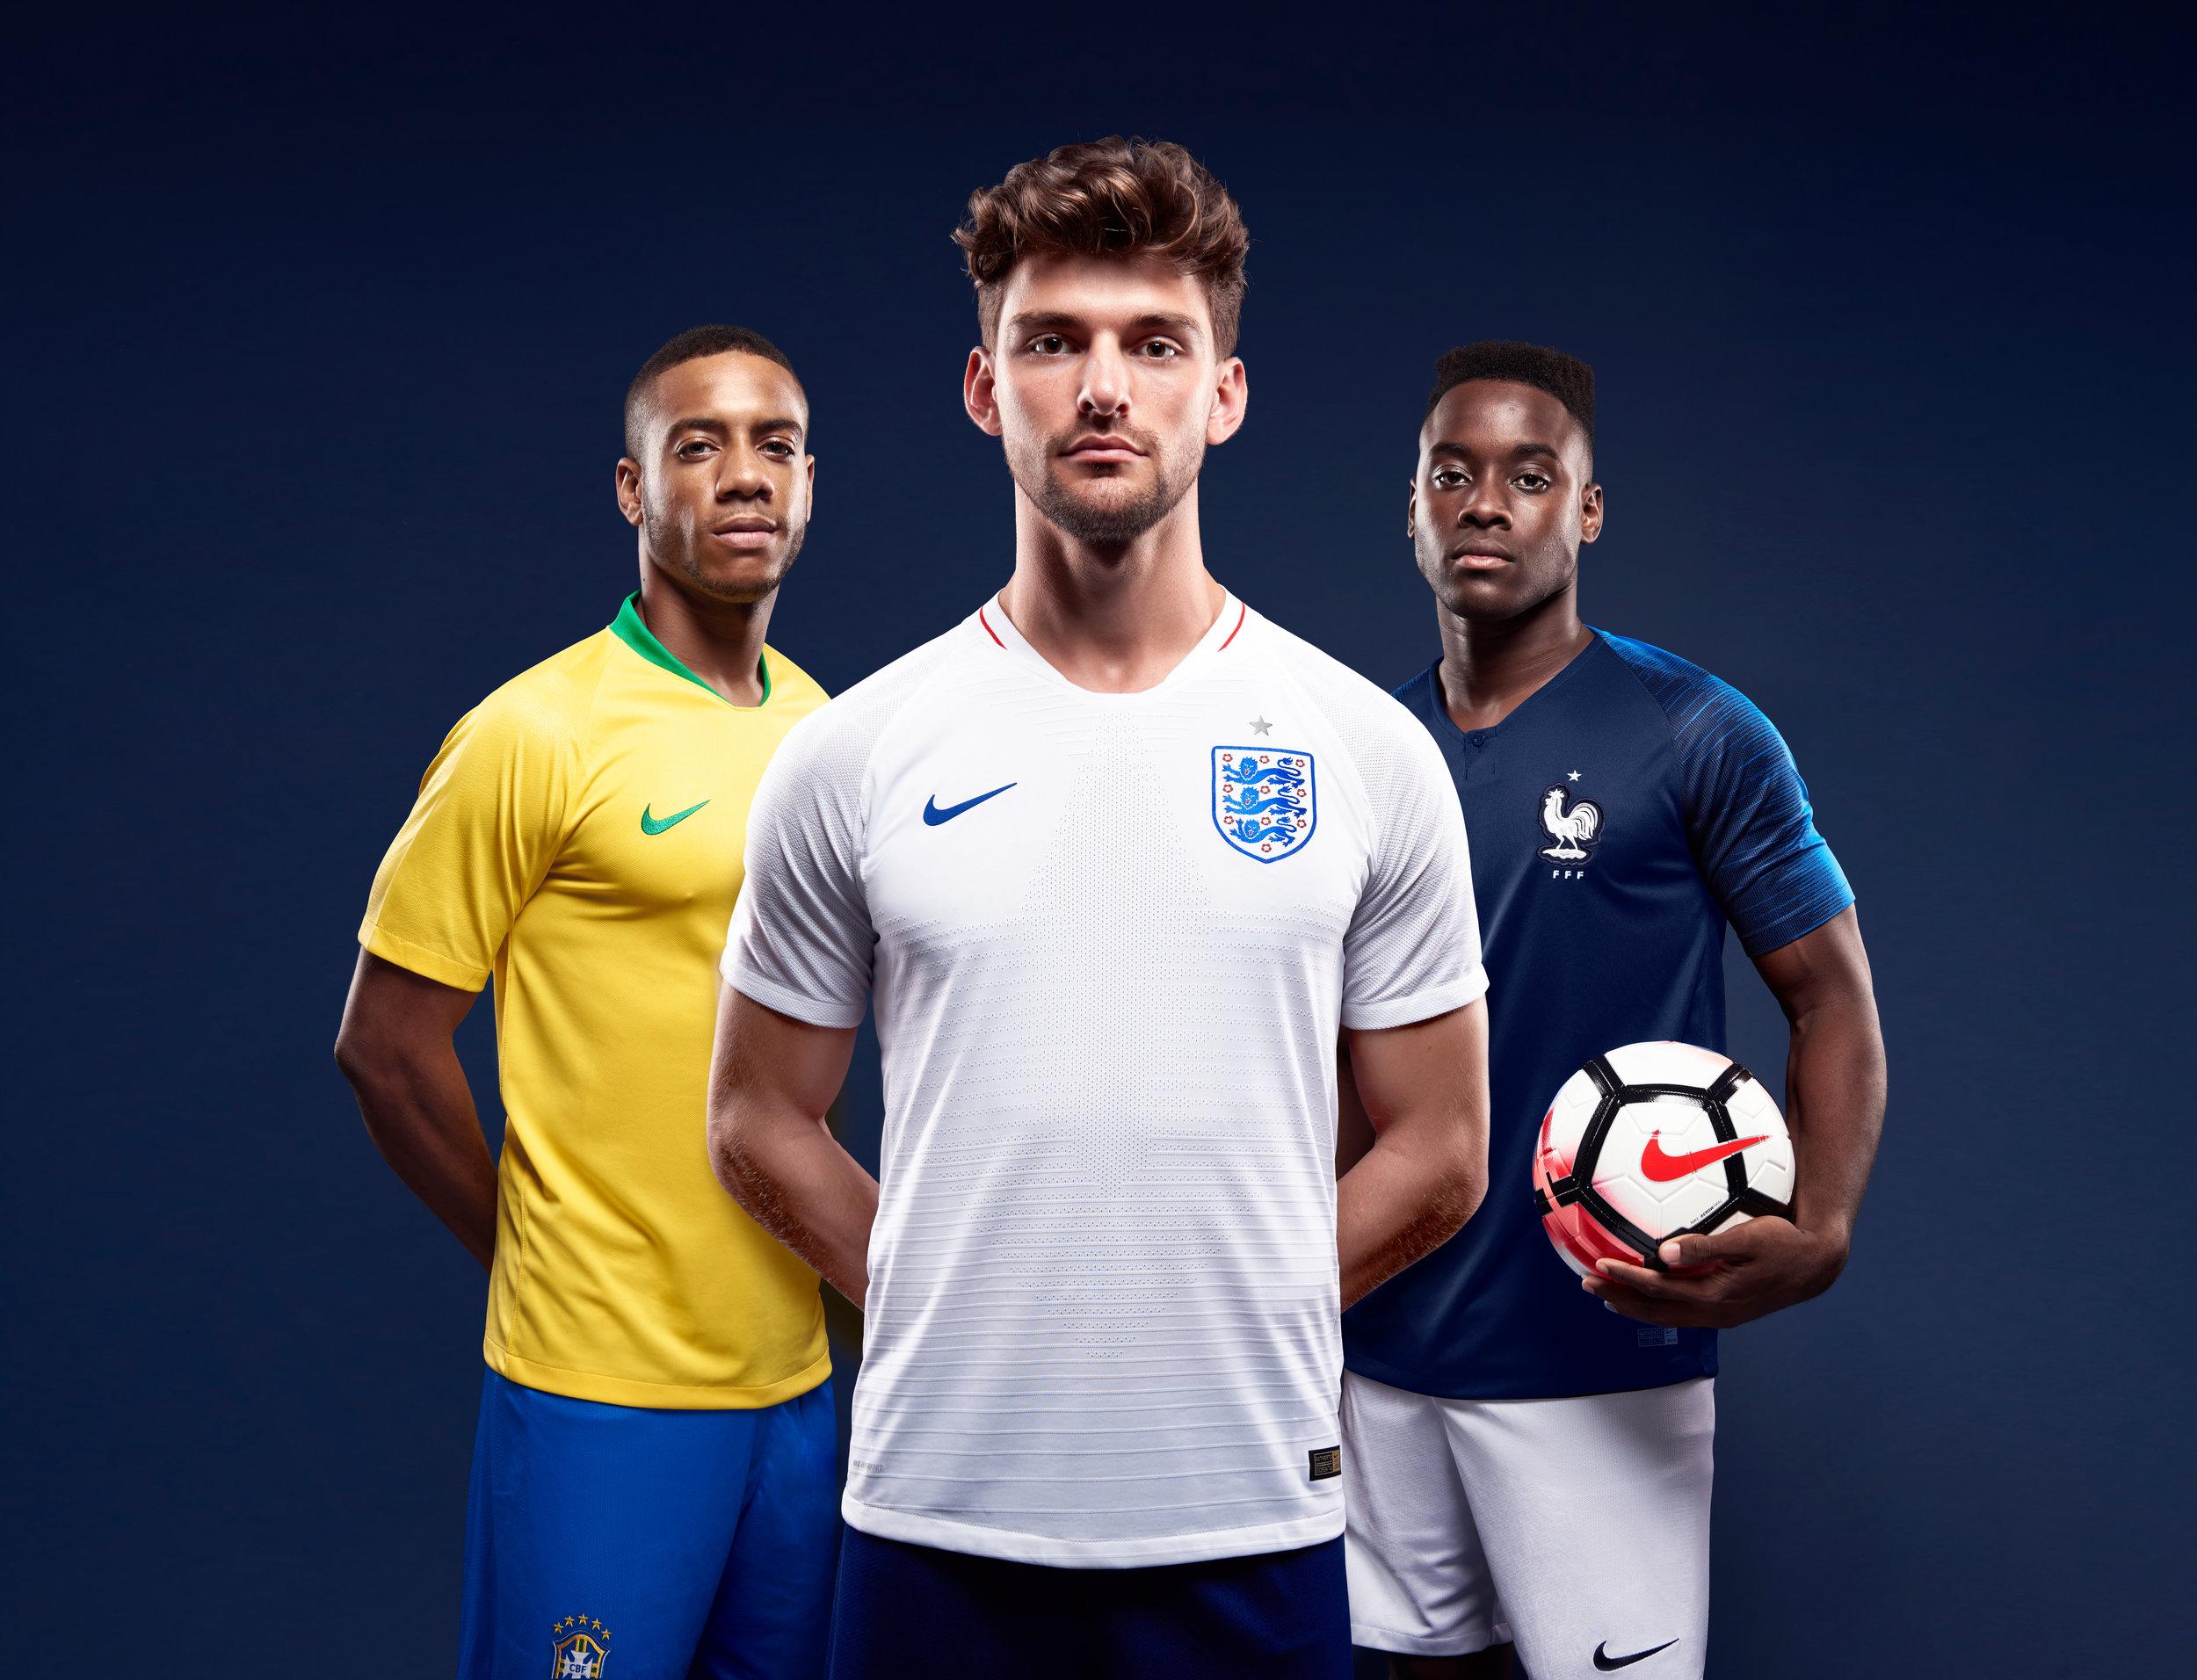 Nike World Cup 2018 Photoshoot England France Brazil Photos taken by Nick Pecori Photographer Tampa Orlando Florida 13.jpg